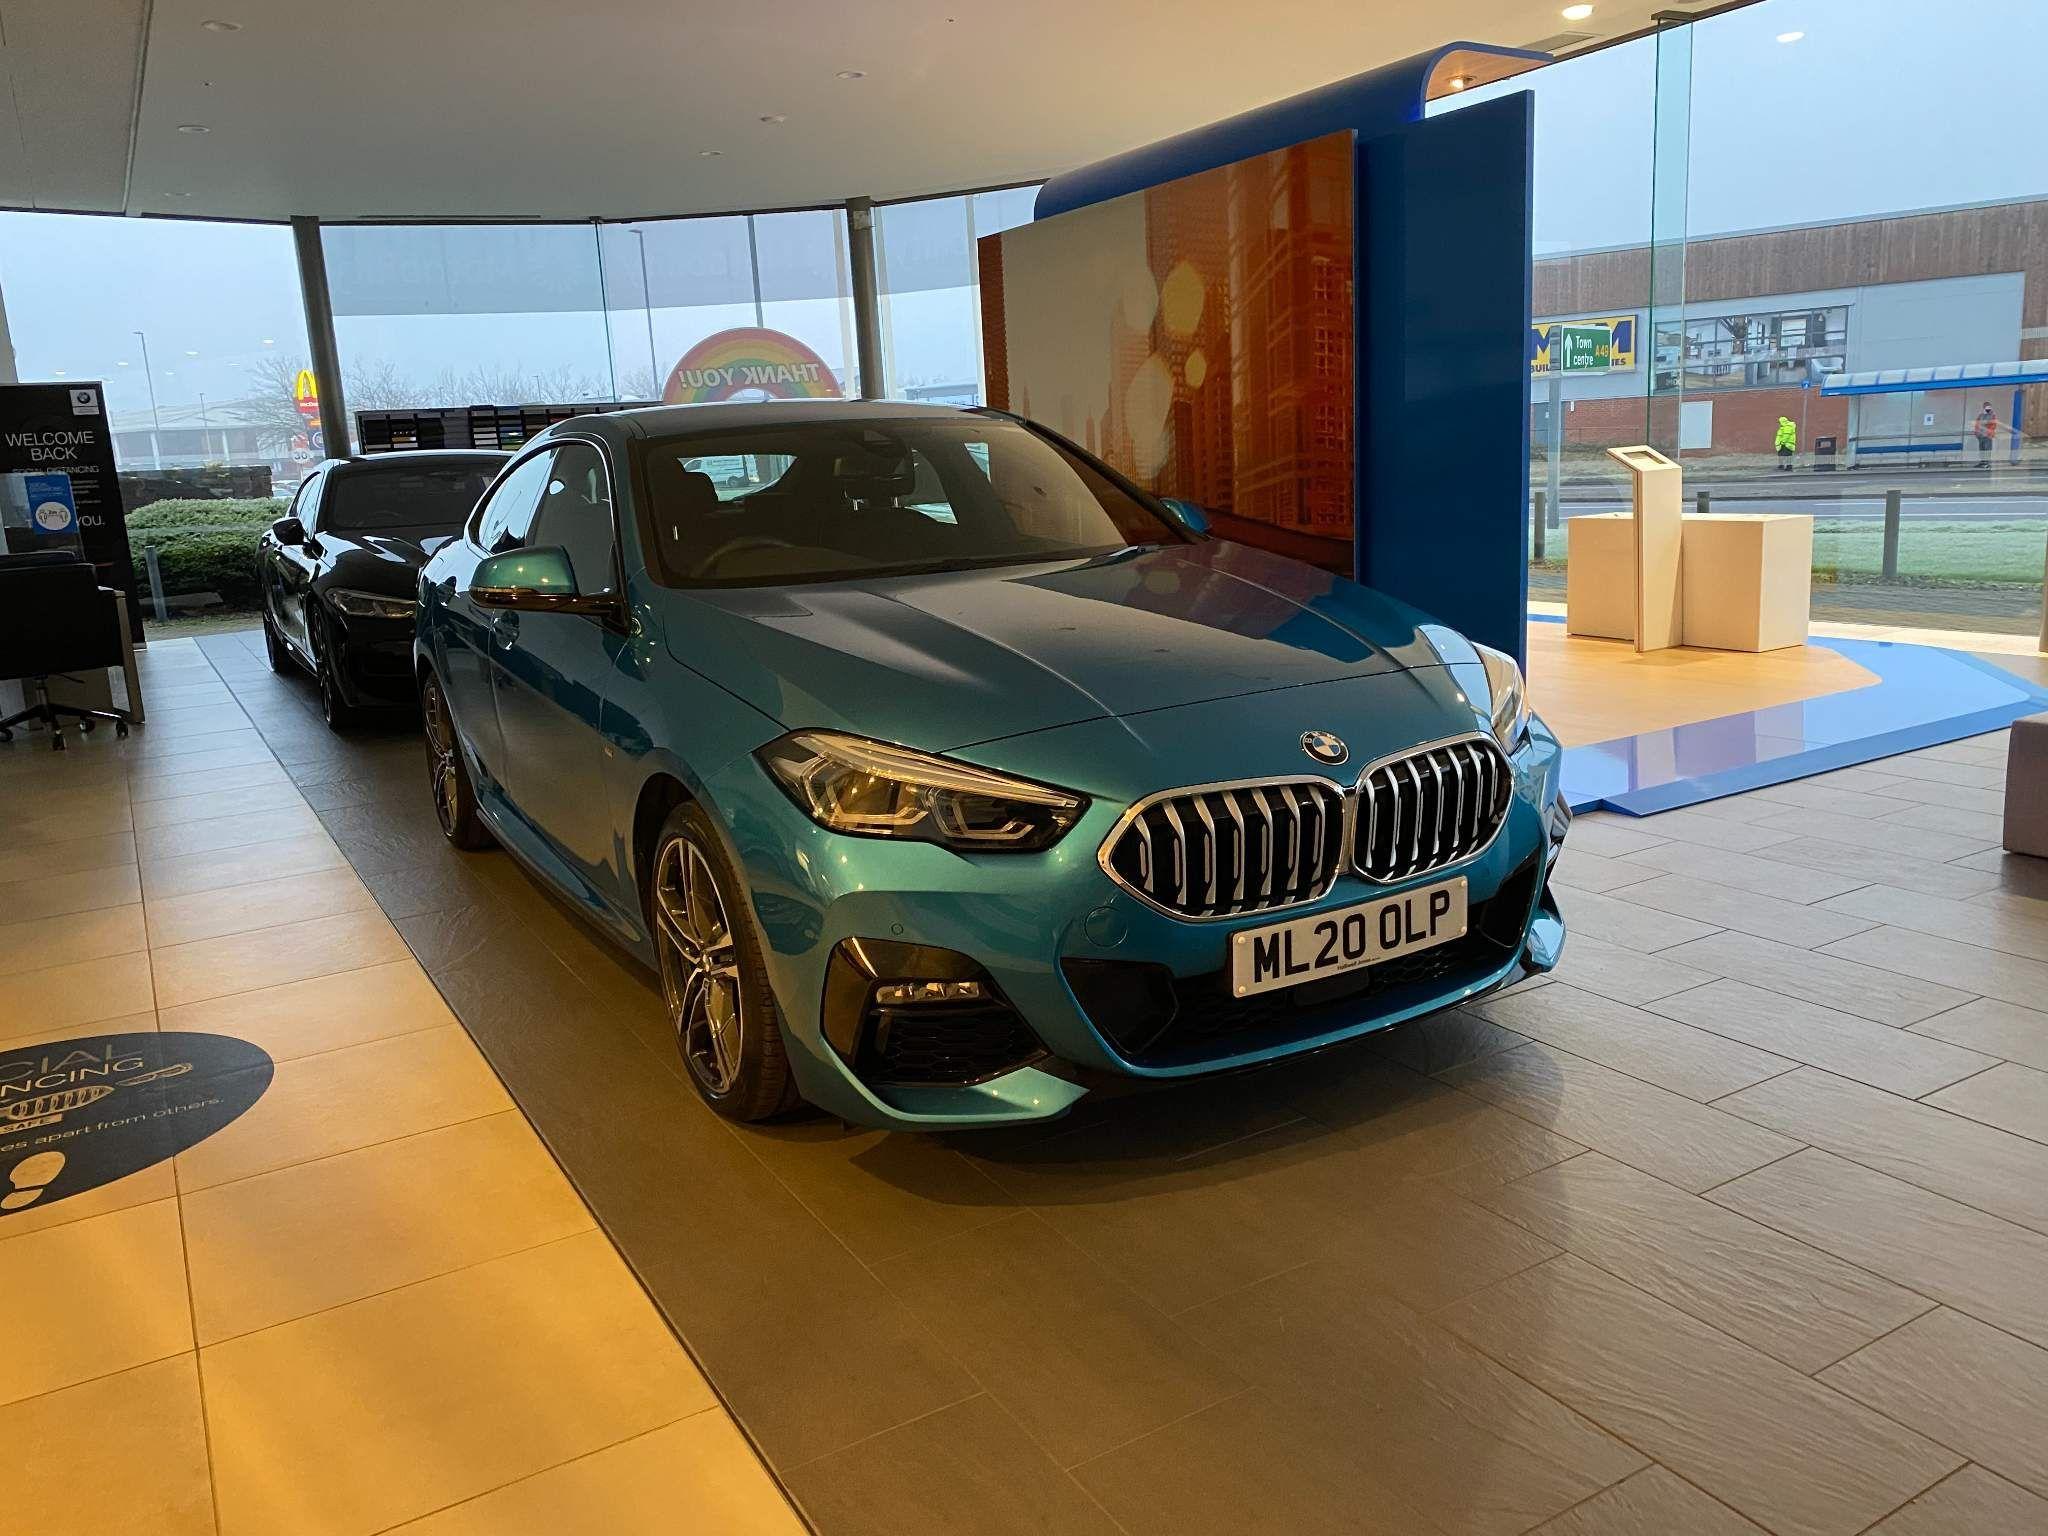 Image 1 - BMW 218i M Sport Gran Coupe (ML20OLP)